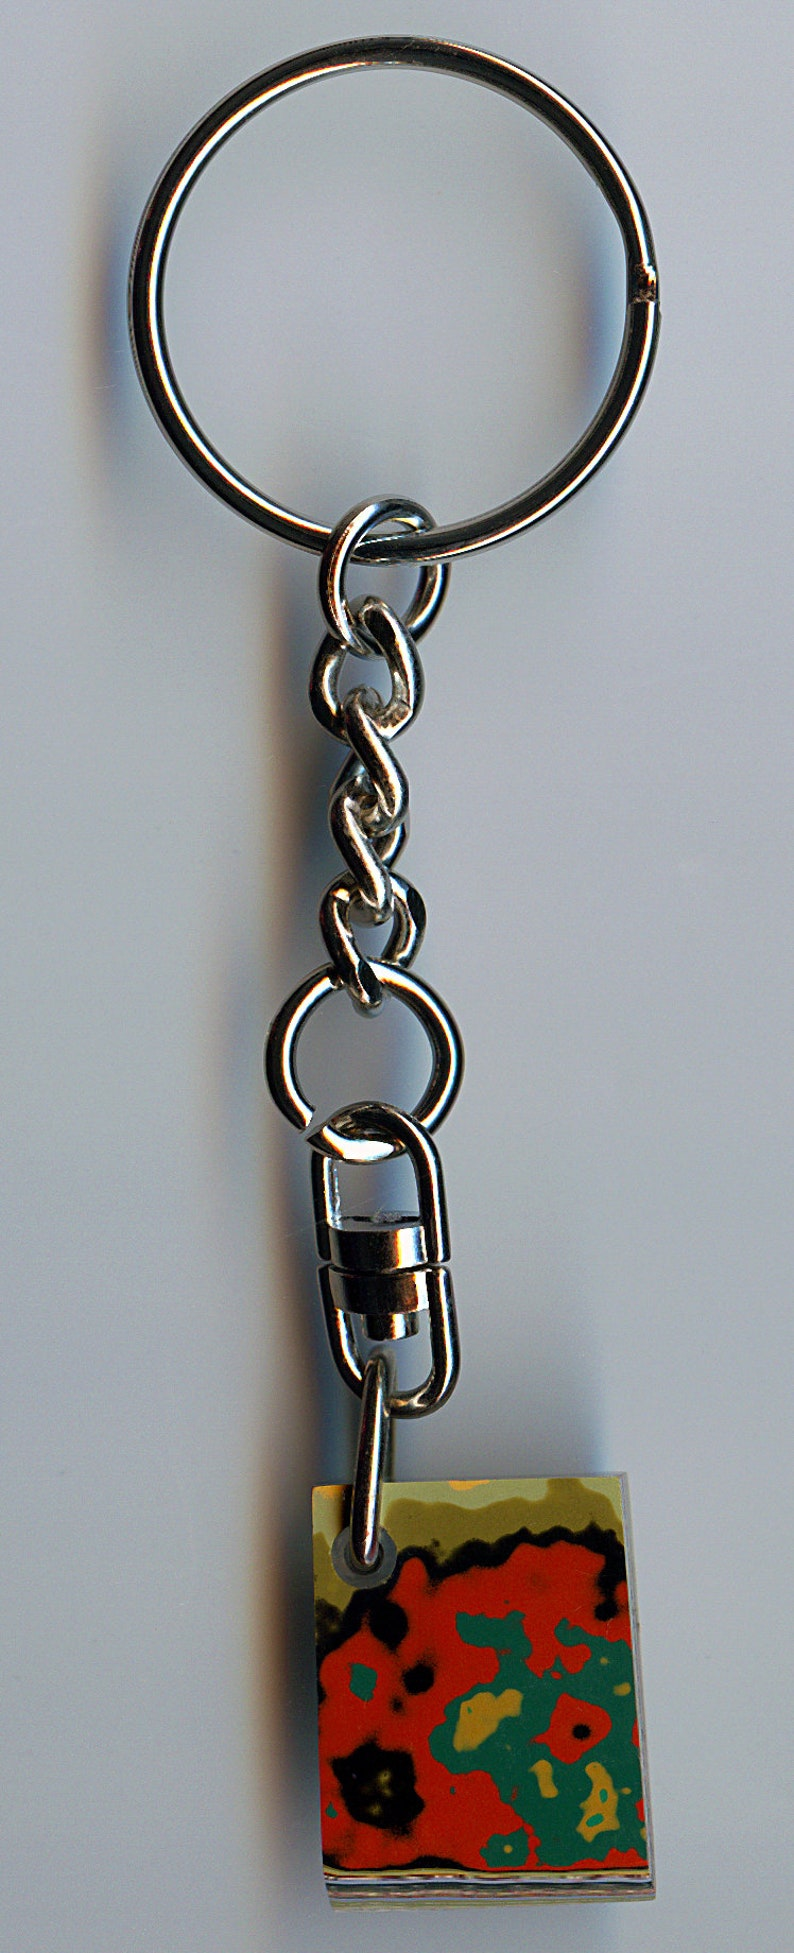 25.4mm x 19.64mm x 5.56mm Premium Grade Fordite Fordite Key Chain 1890